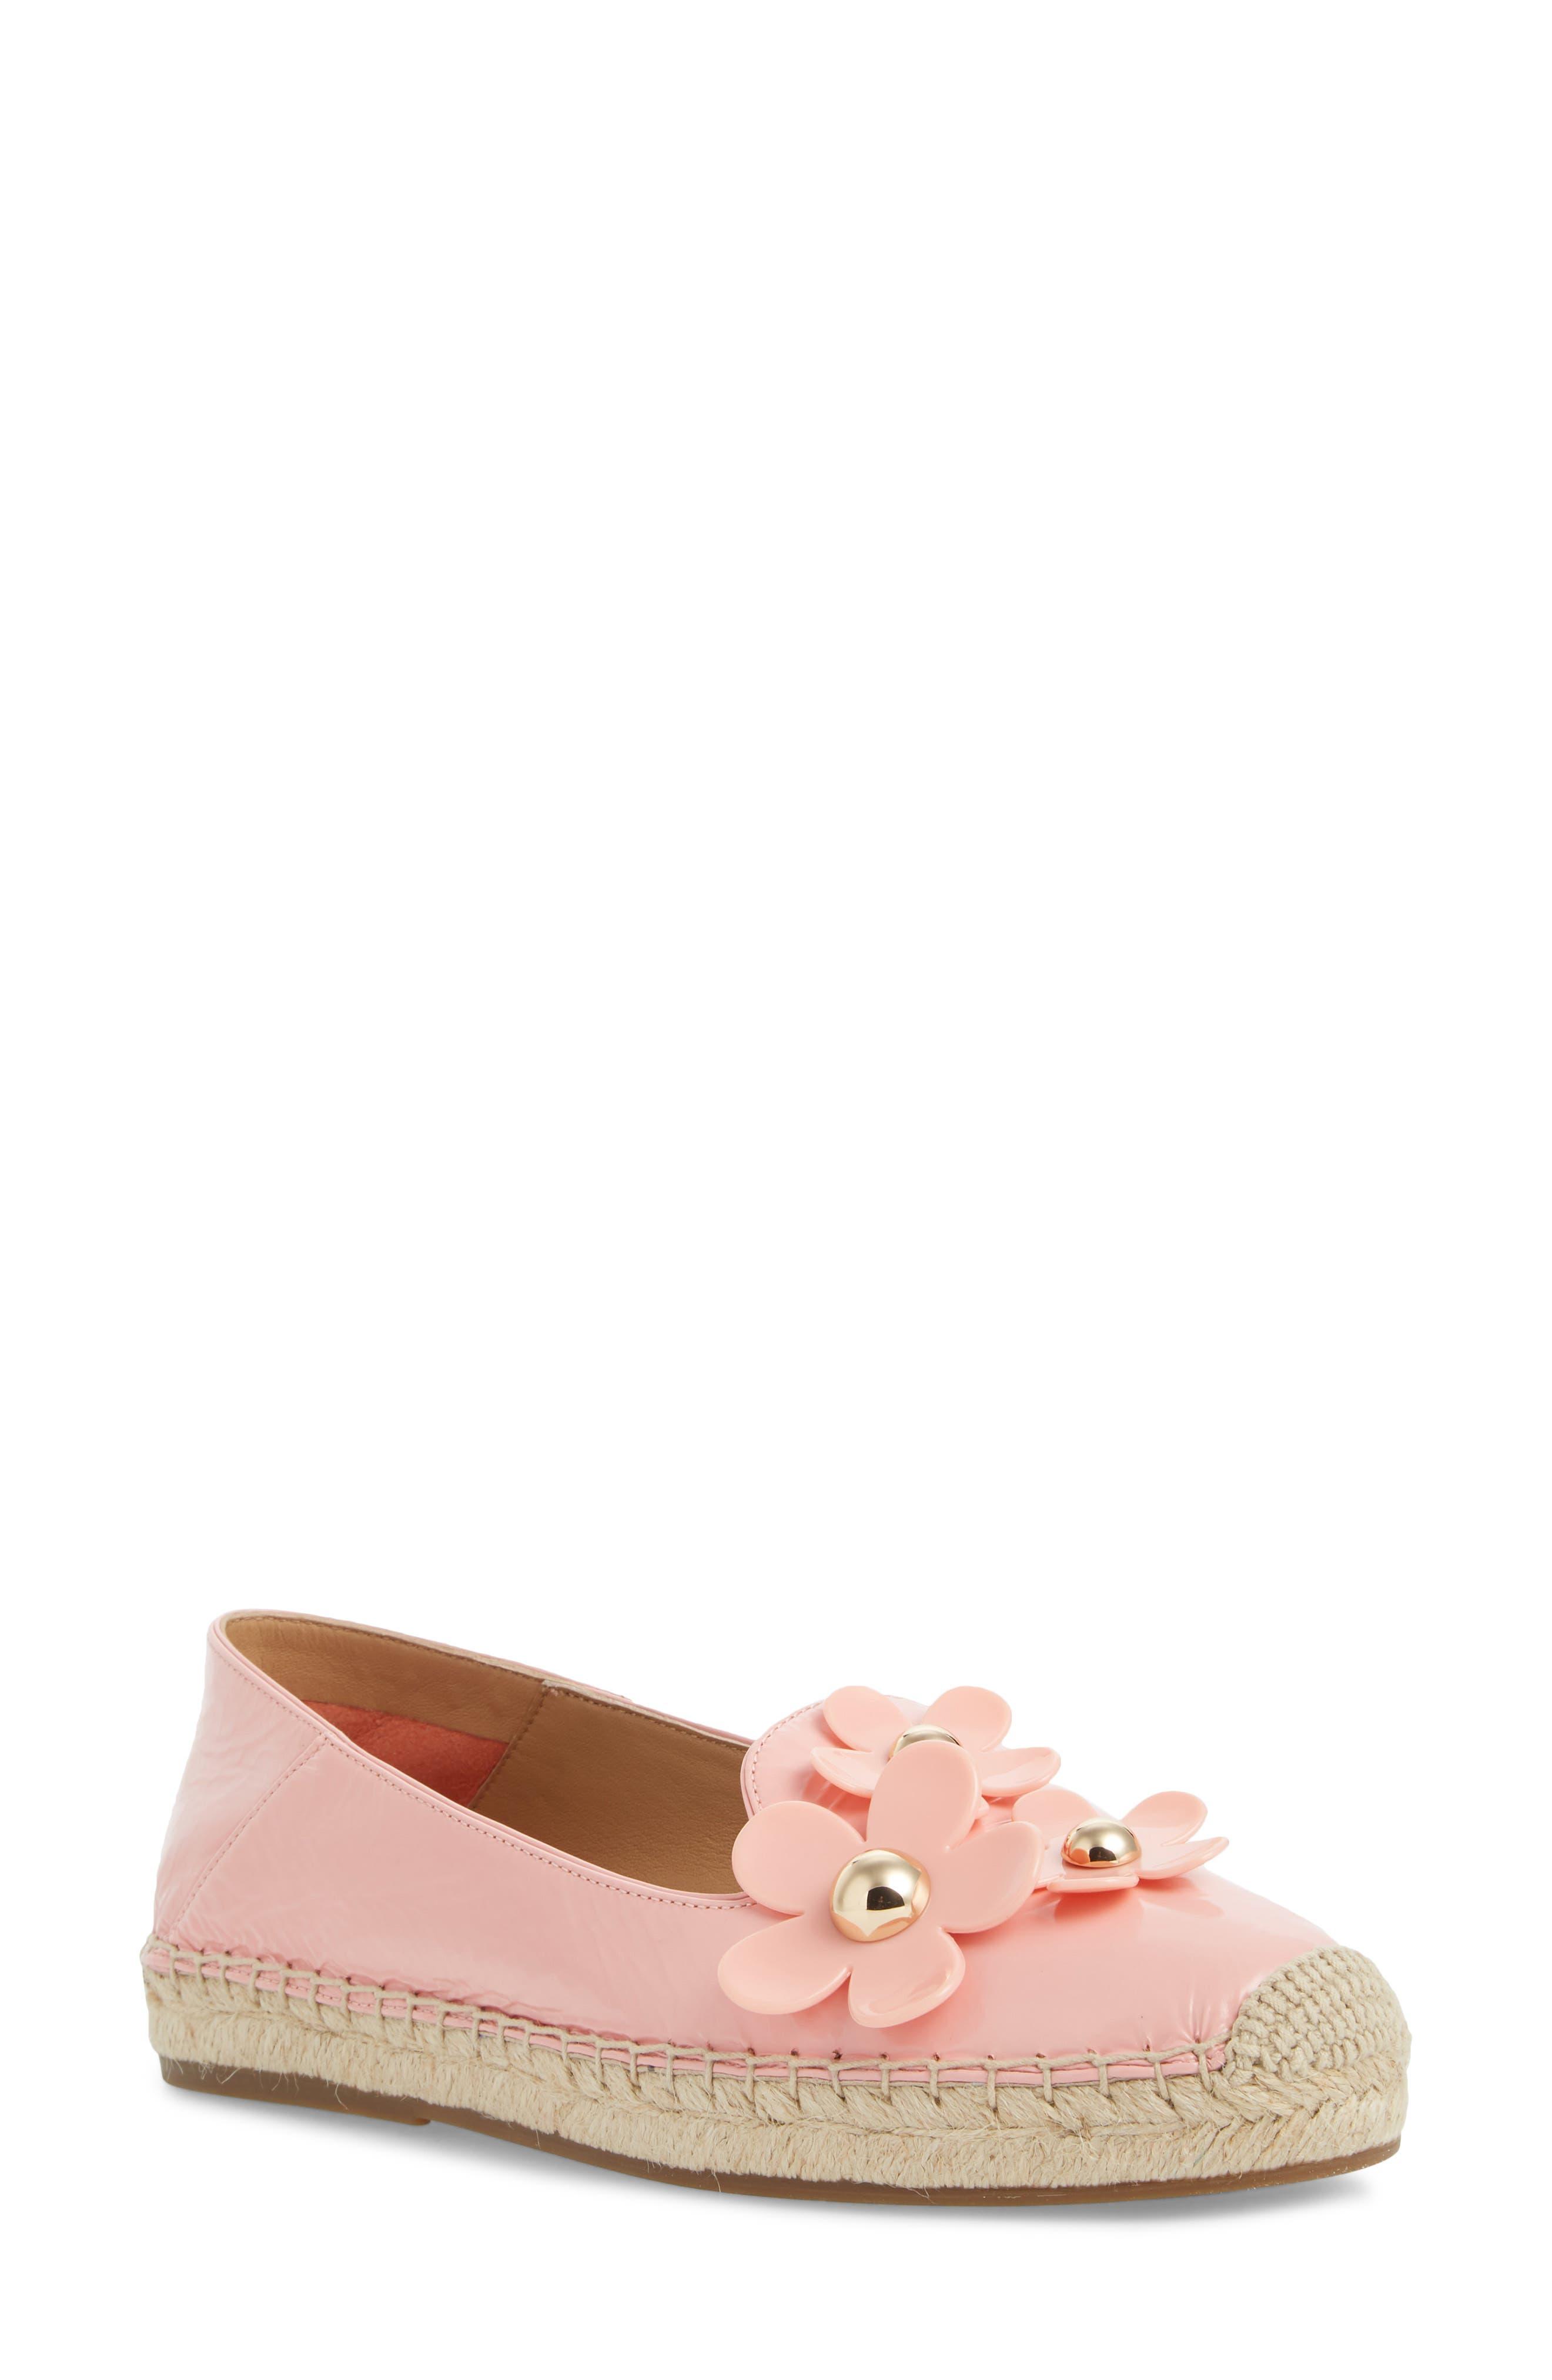 Daisy Studded Espadrille, Light Pink